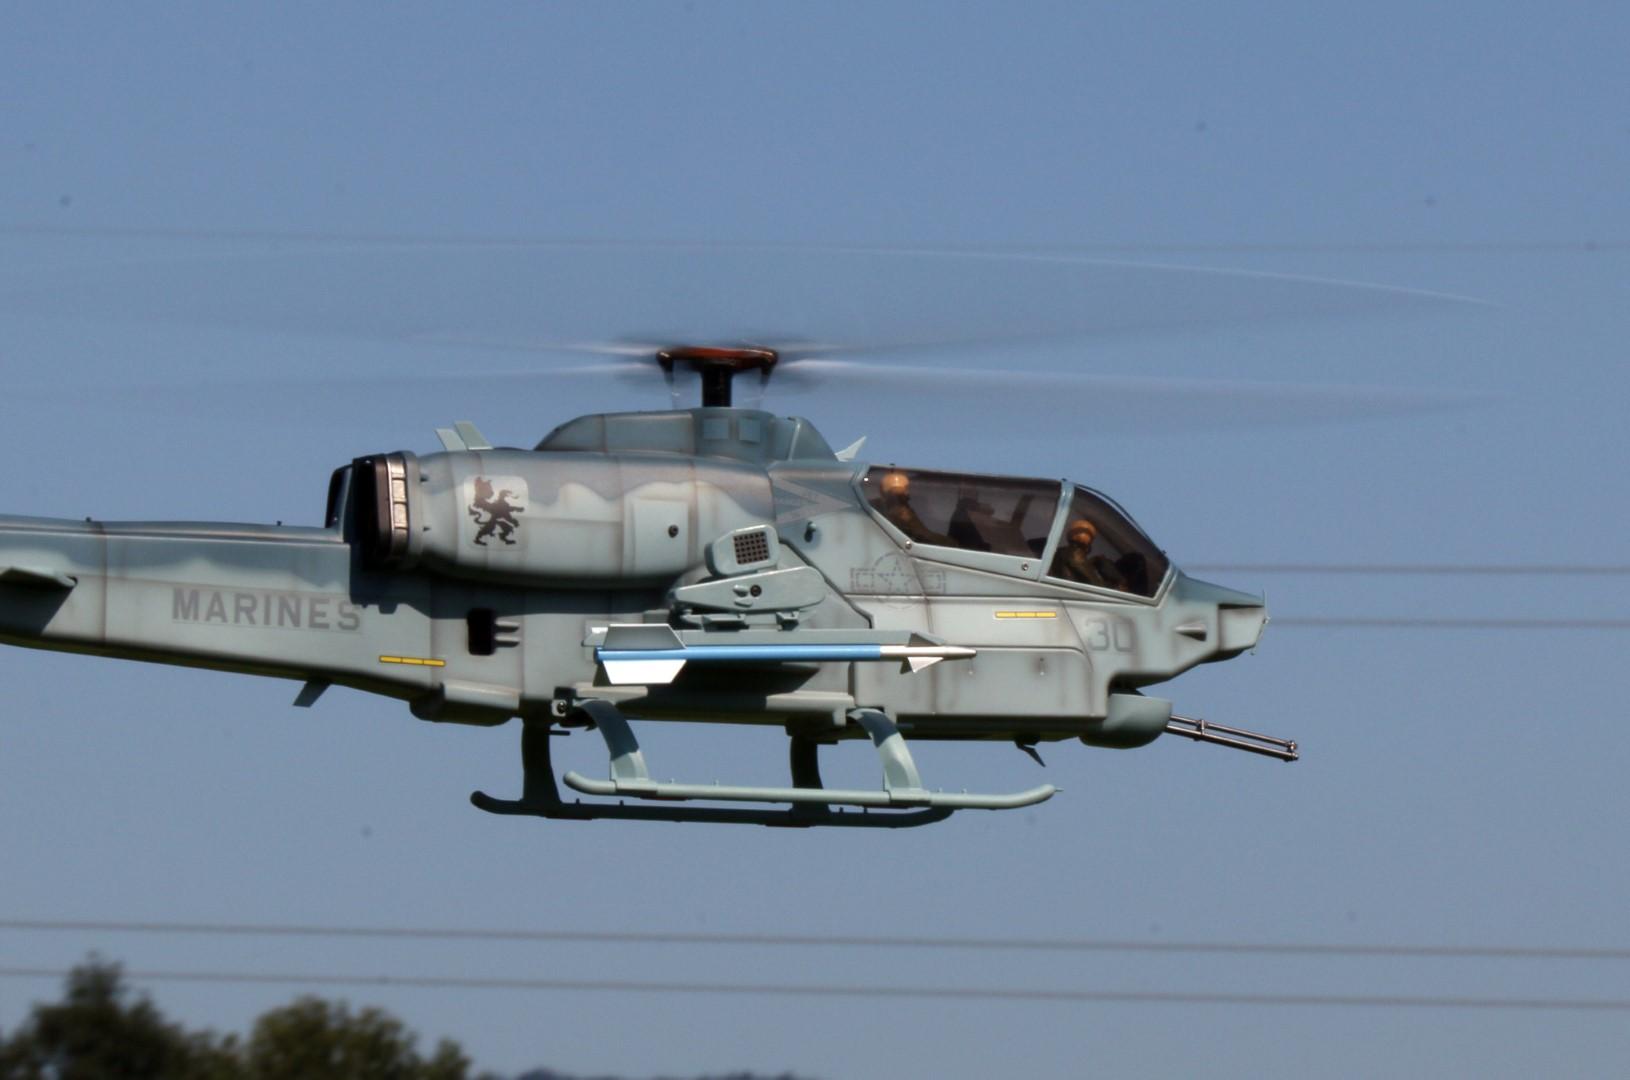 Bell AH-1 - Cobra